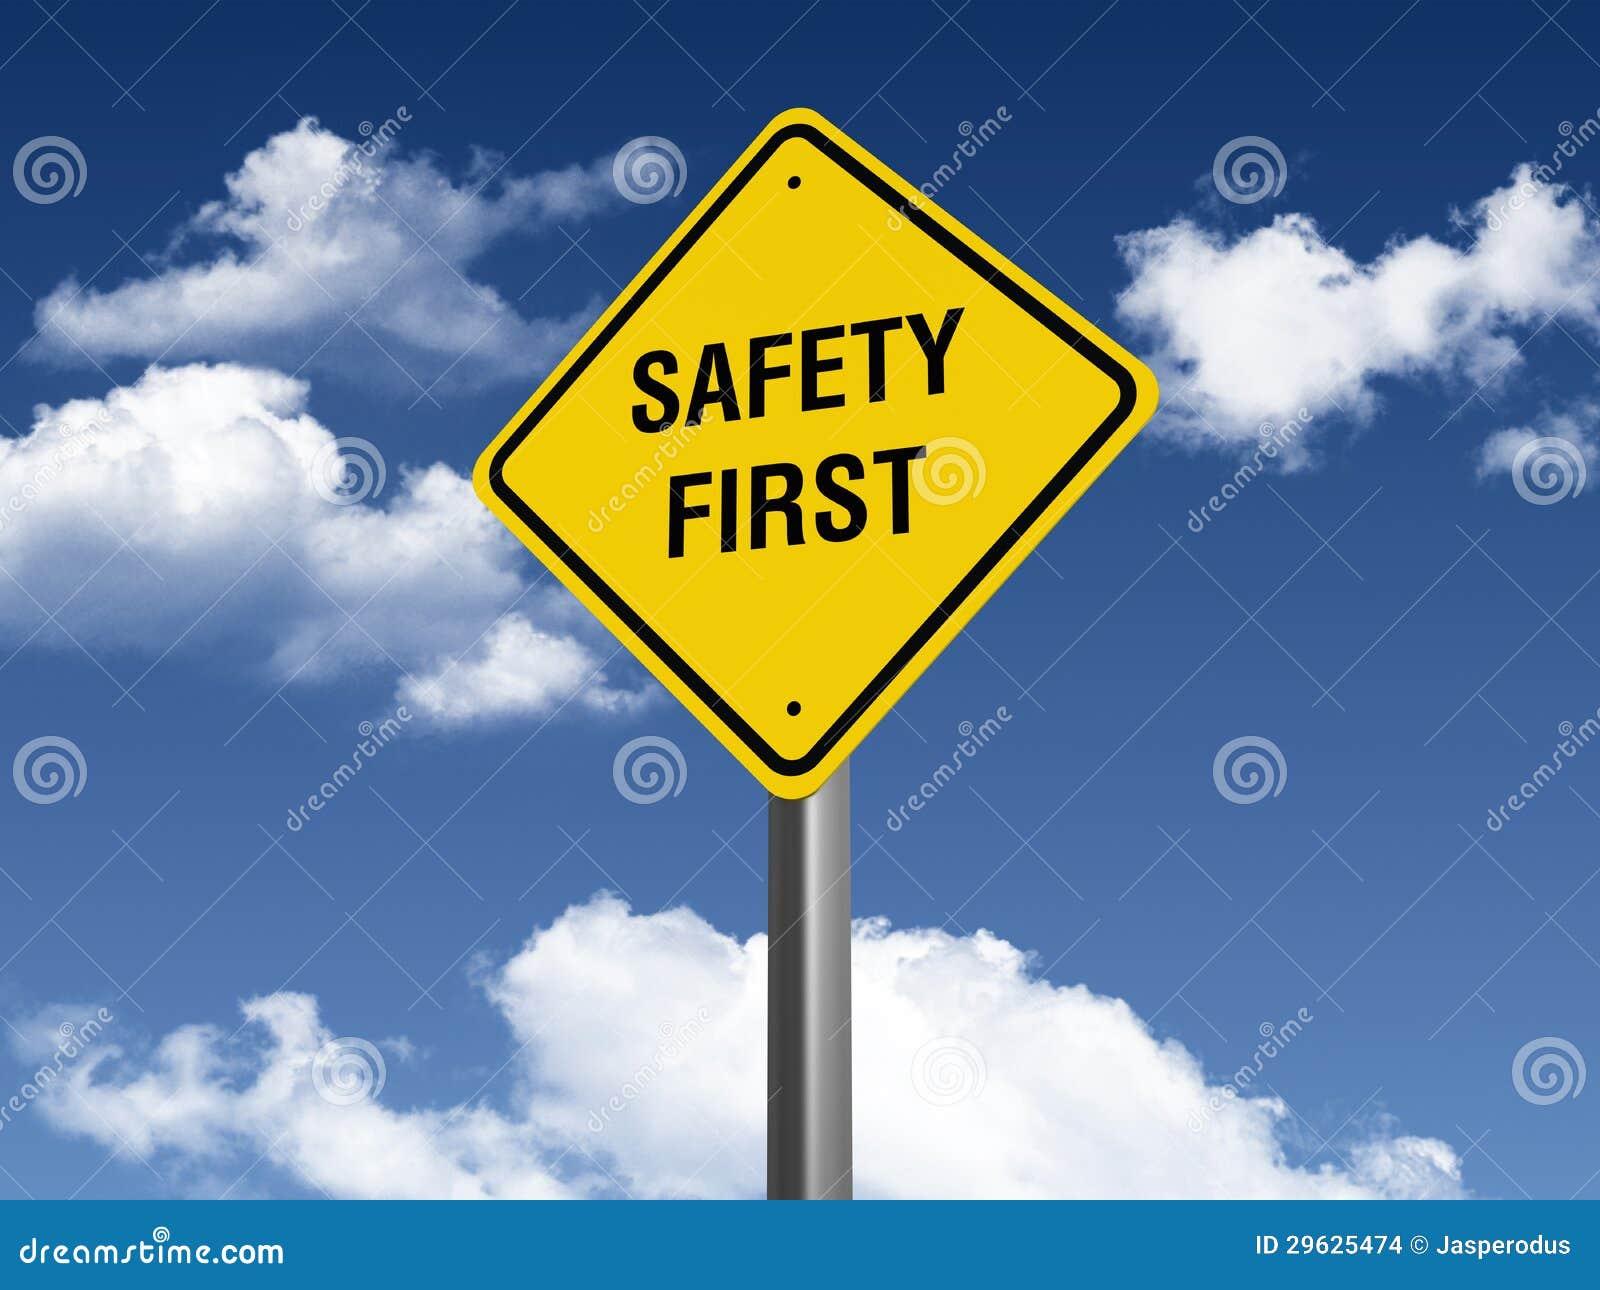 safety first road sign stock images image 29625474. Black Bedroom Furniture Sets. Home Design Ideas